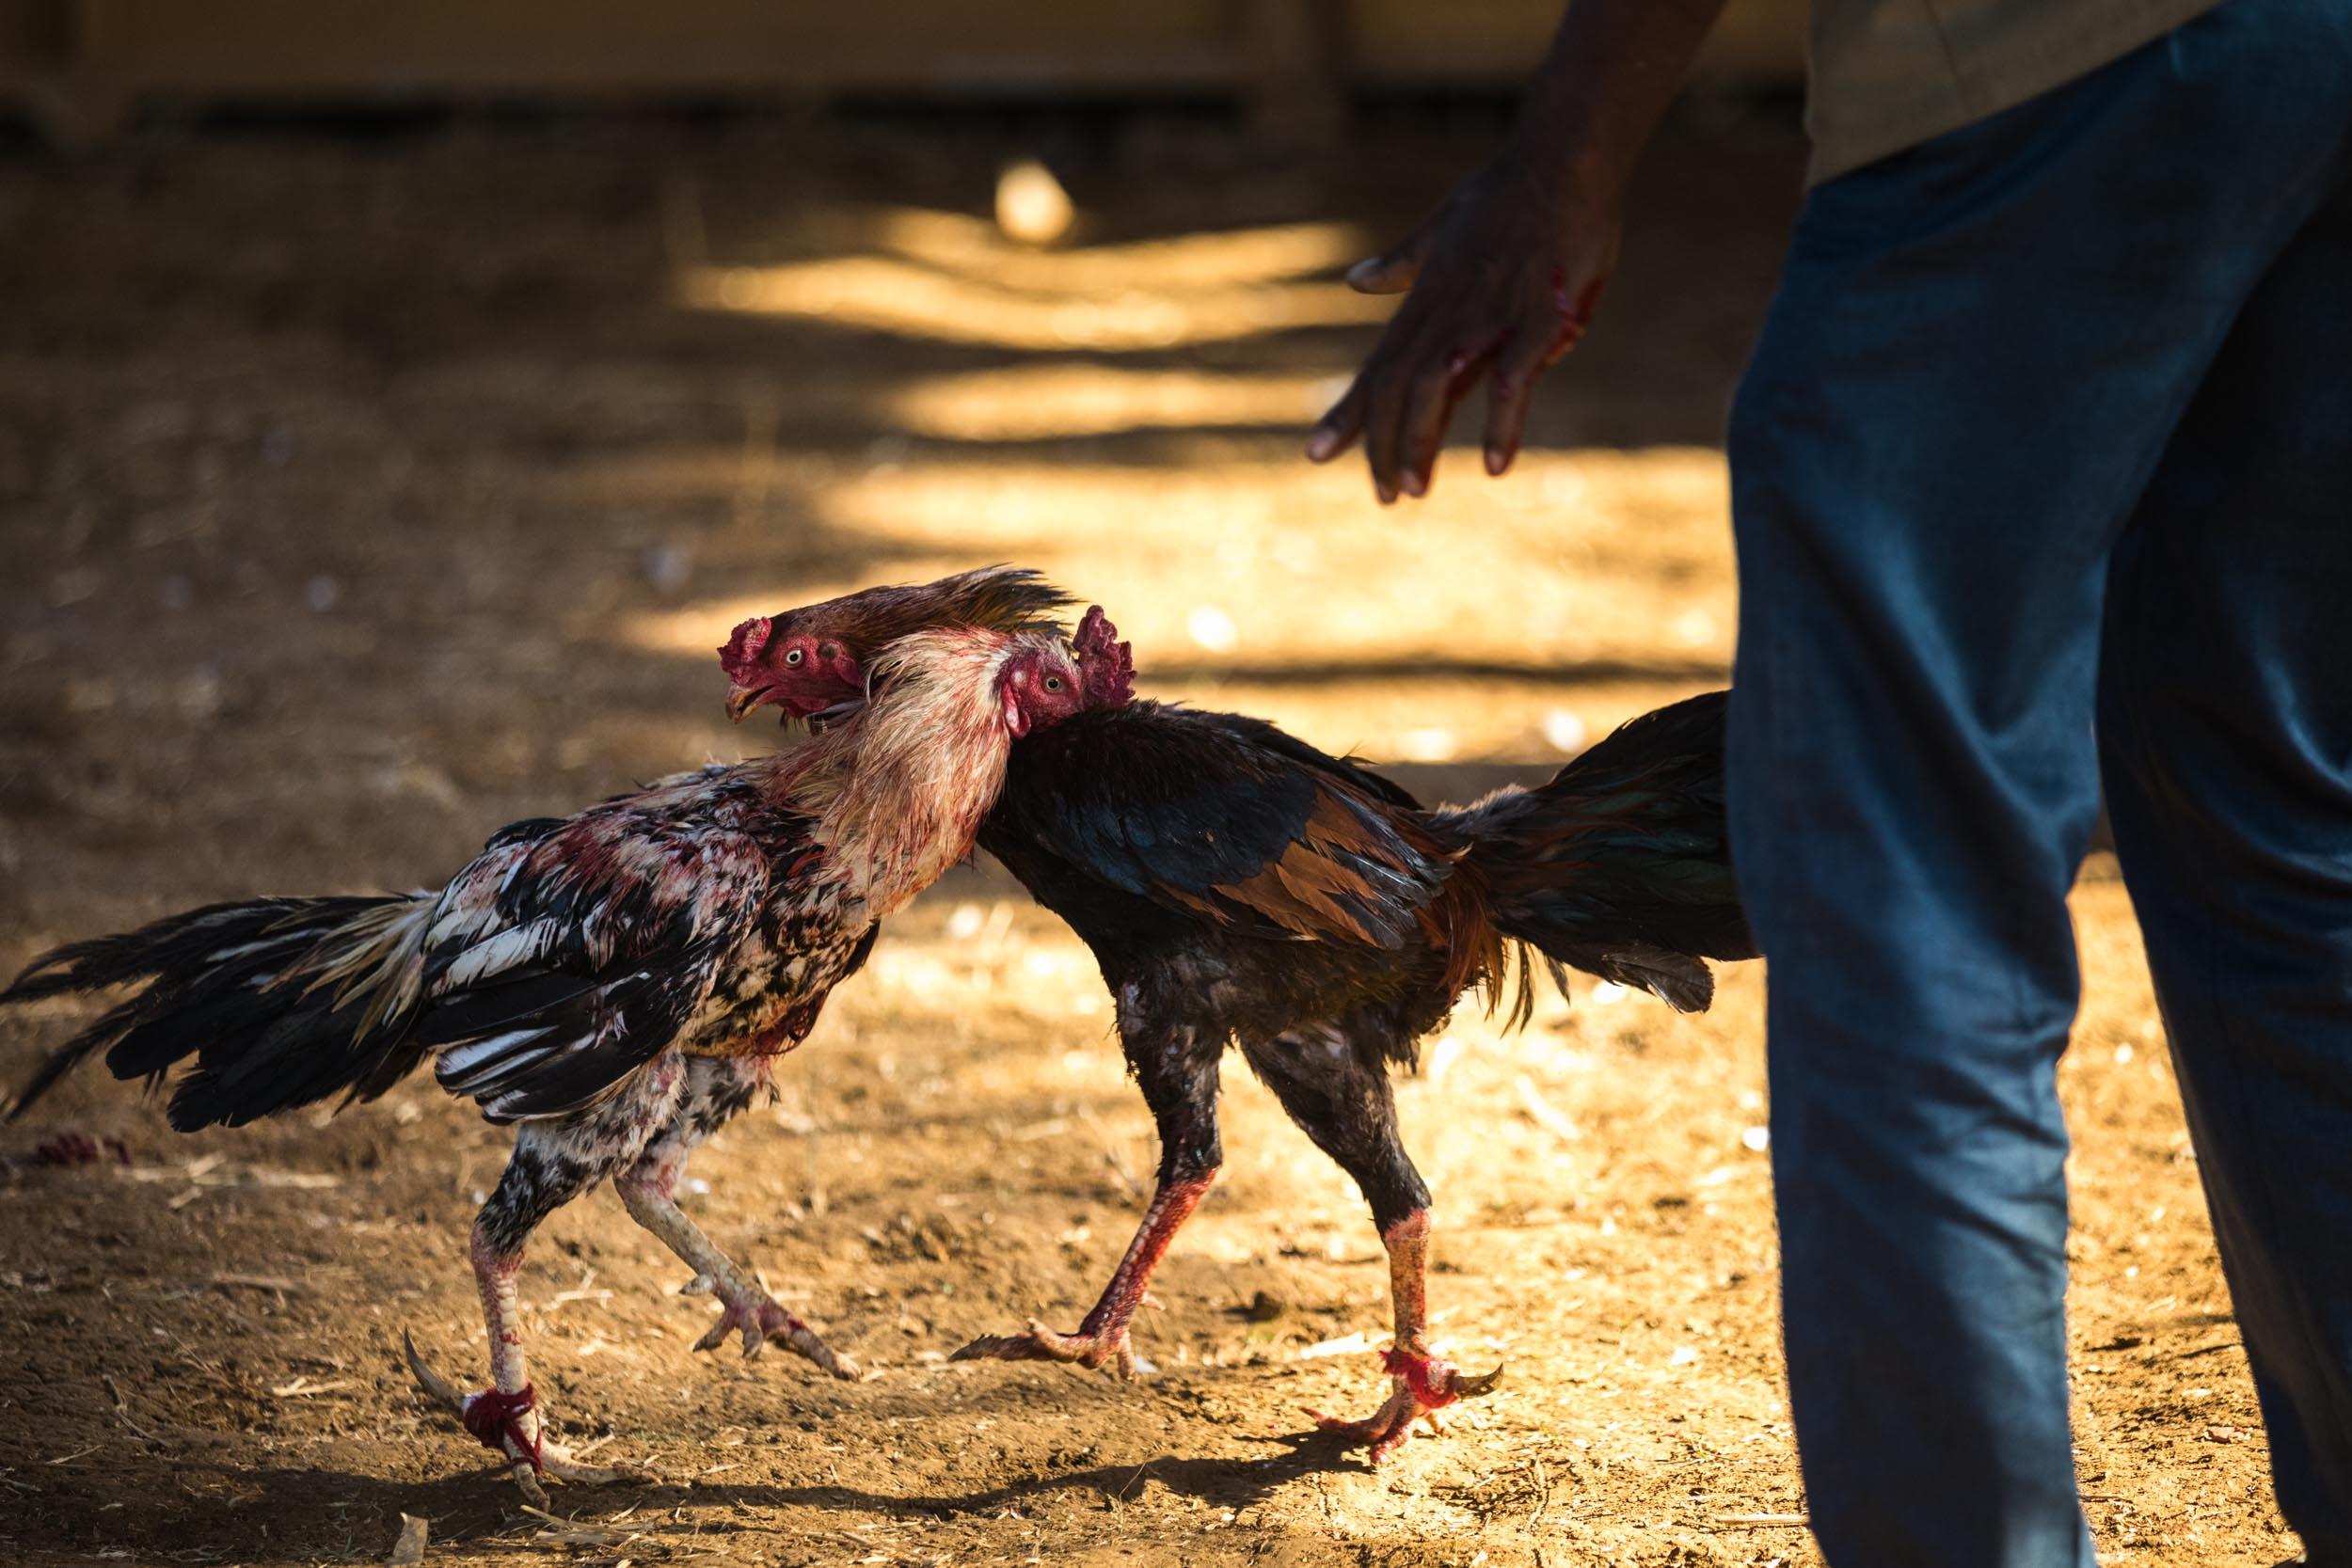 Giuliano_Berti_Chicken-Fight_India-7.jpg